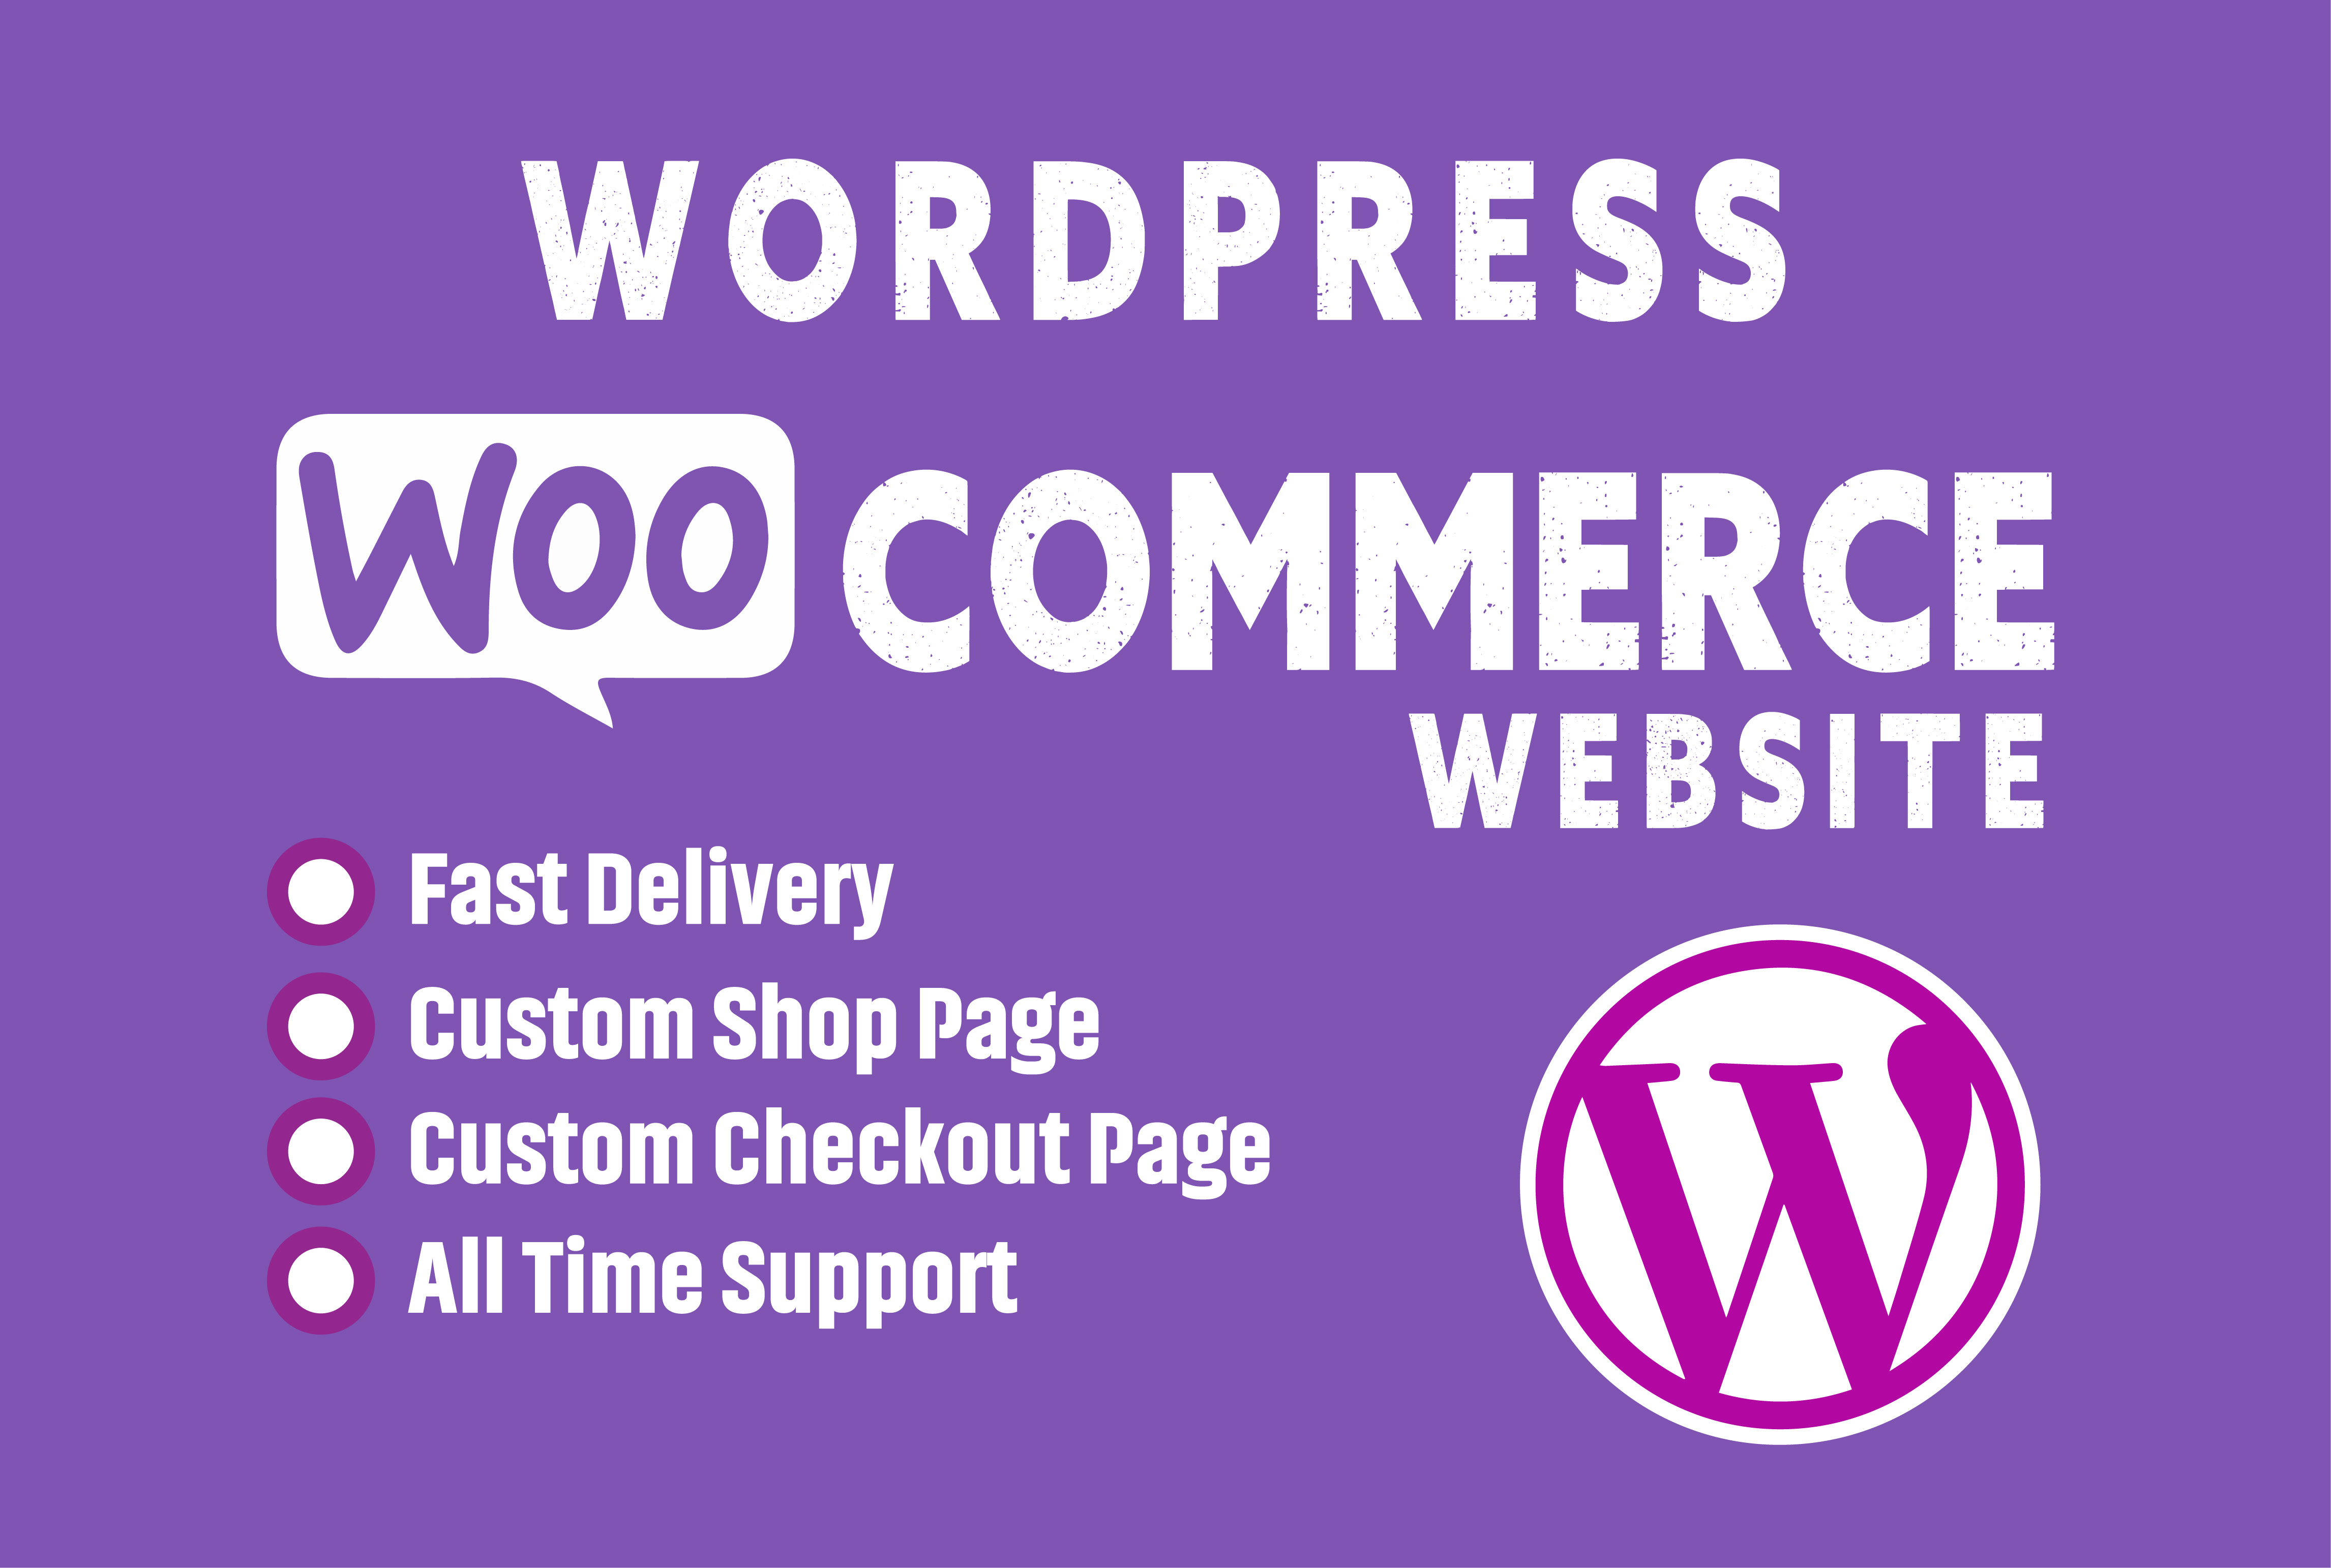 I will build wordpress ecommerce website online store using woocommerce